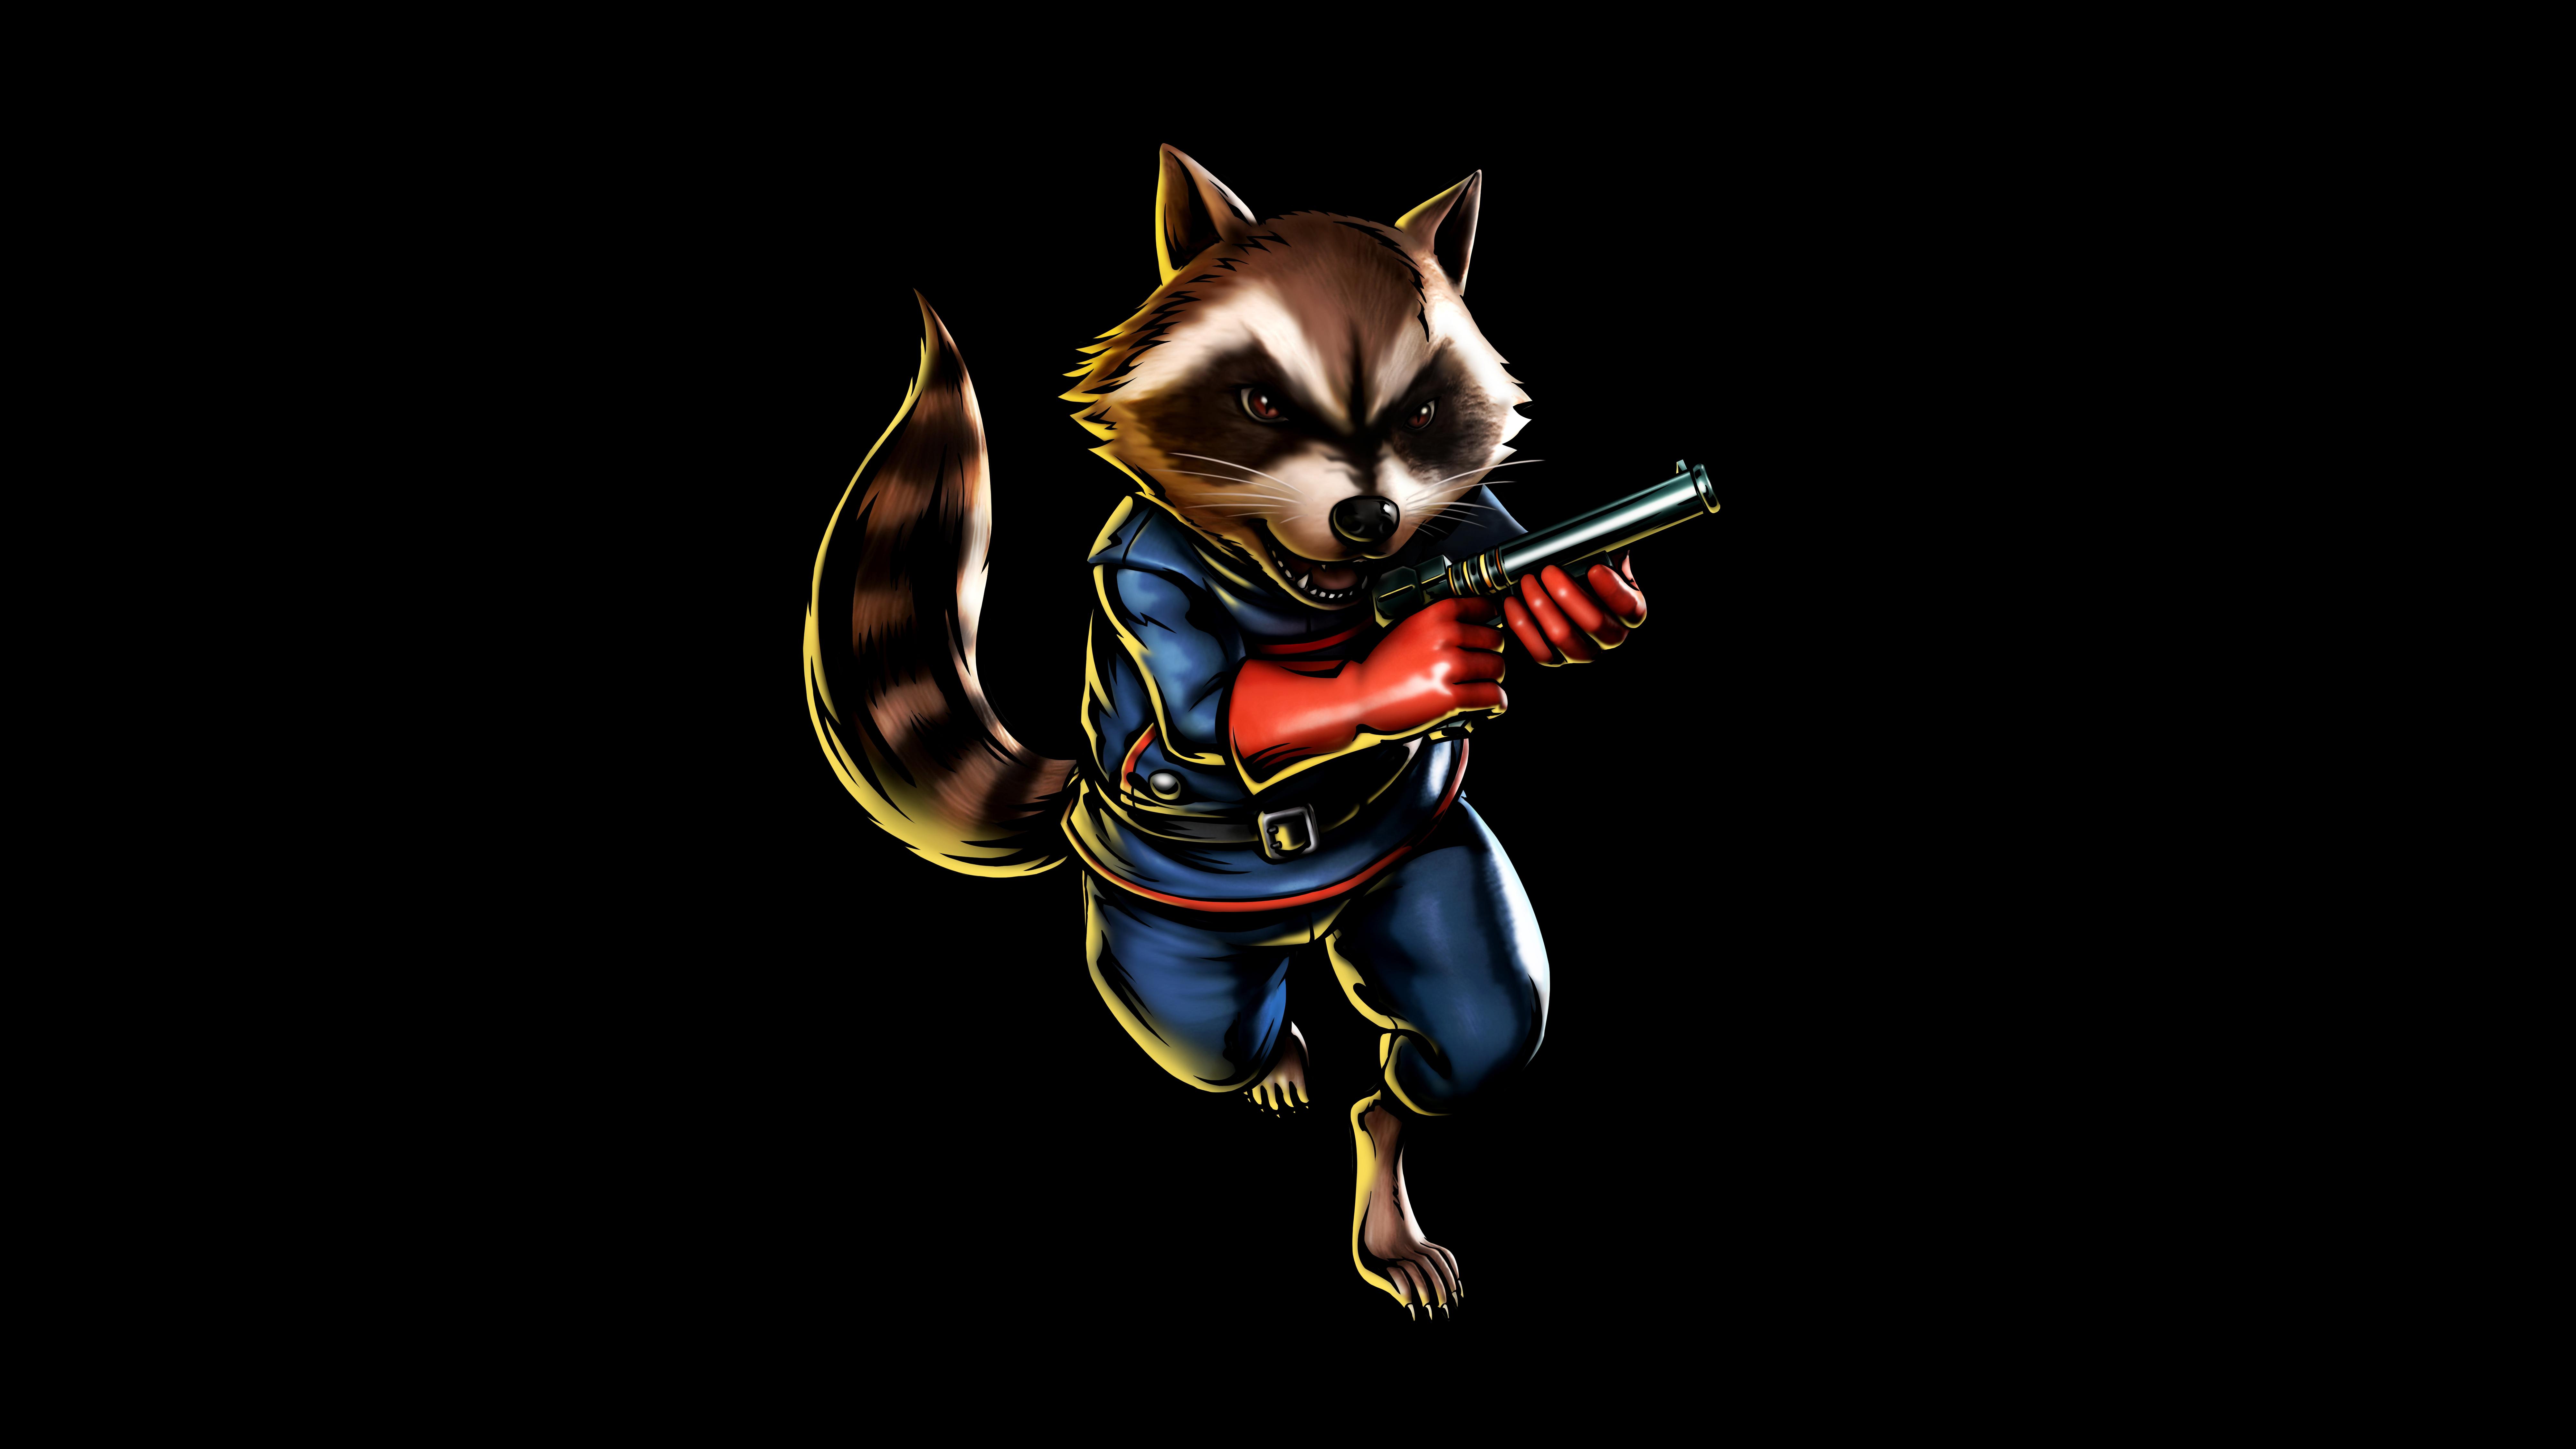 Rocket Raccoon 8k Ultra HD Wallpaper And Background Image